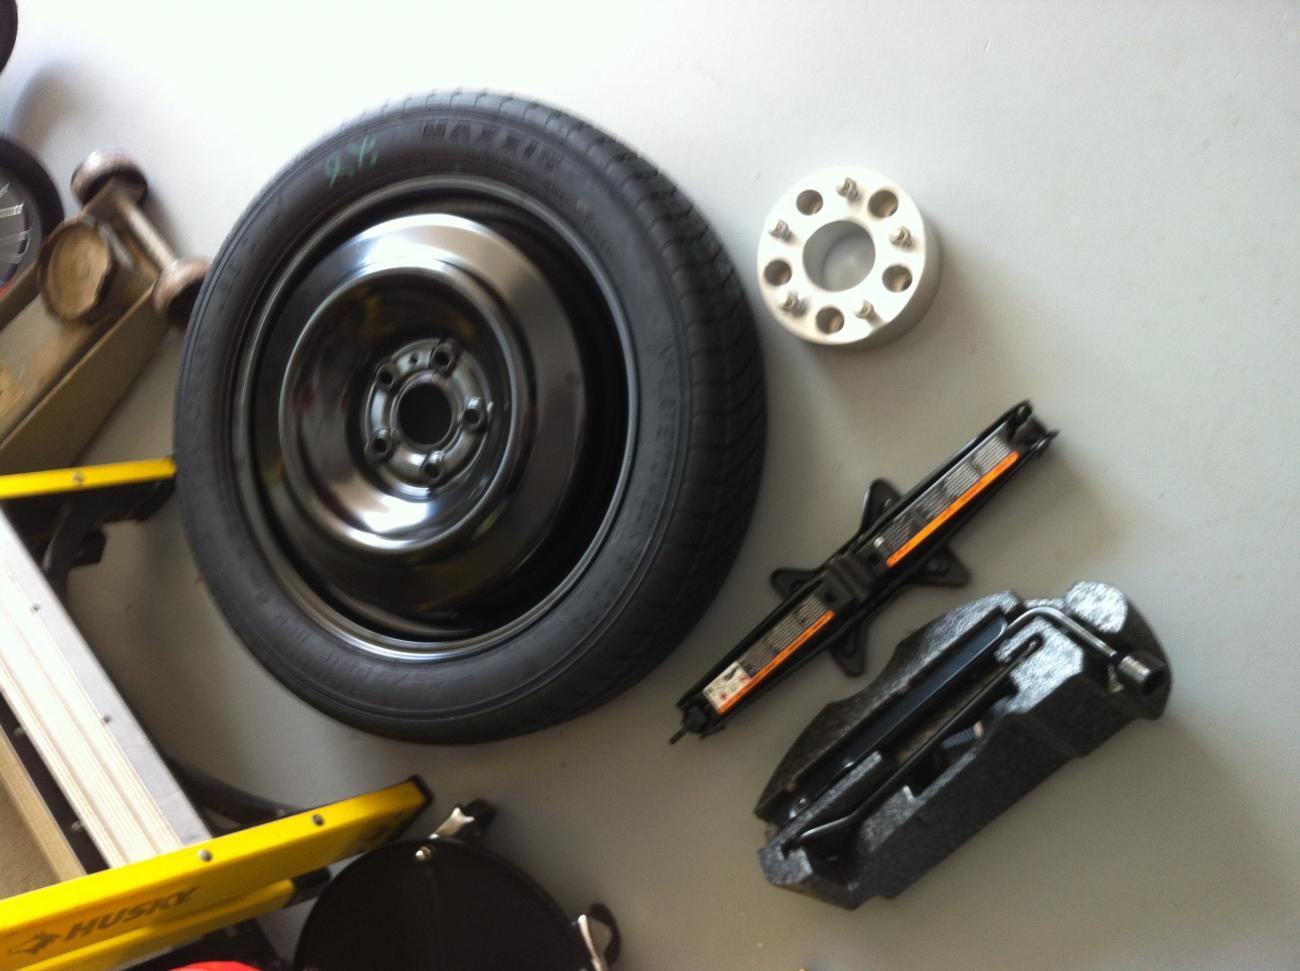 spare tire spacer jack kit for sale camaro5 chevy camaro forum camaro zl1 ss and v6. Black Bedroom Furniture Sets. Home Design Ideas